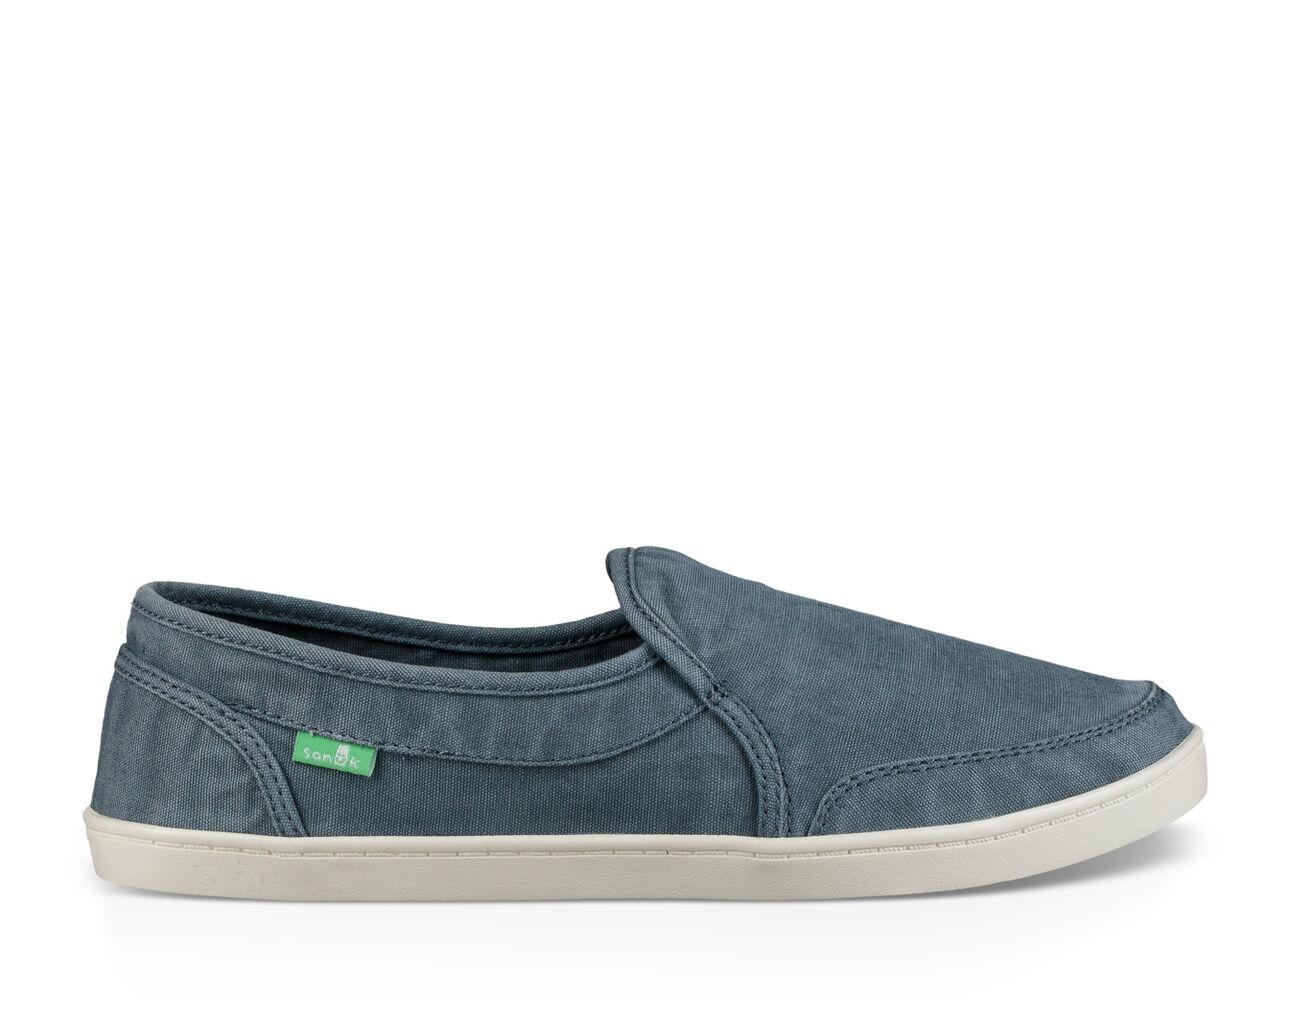 8e548ec945d0 Women s Pair O Dice Slip-on Sneakers